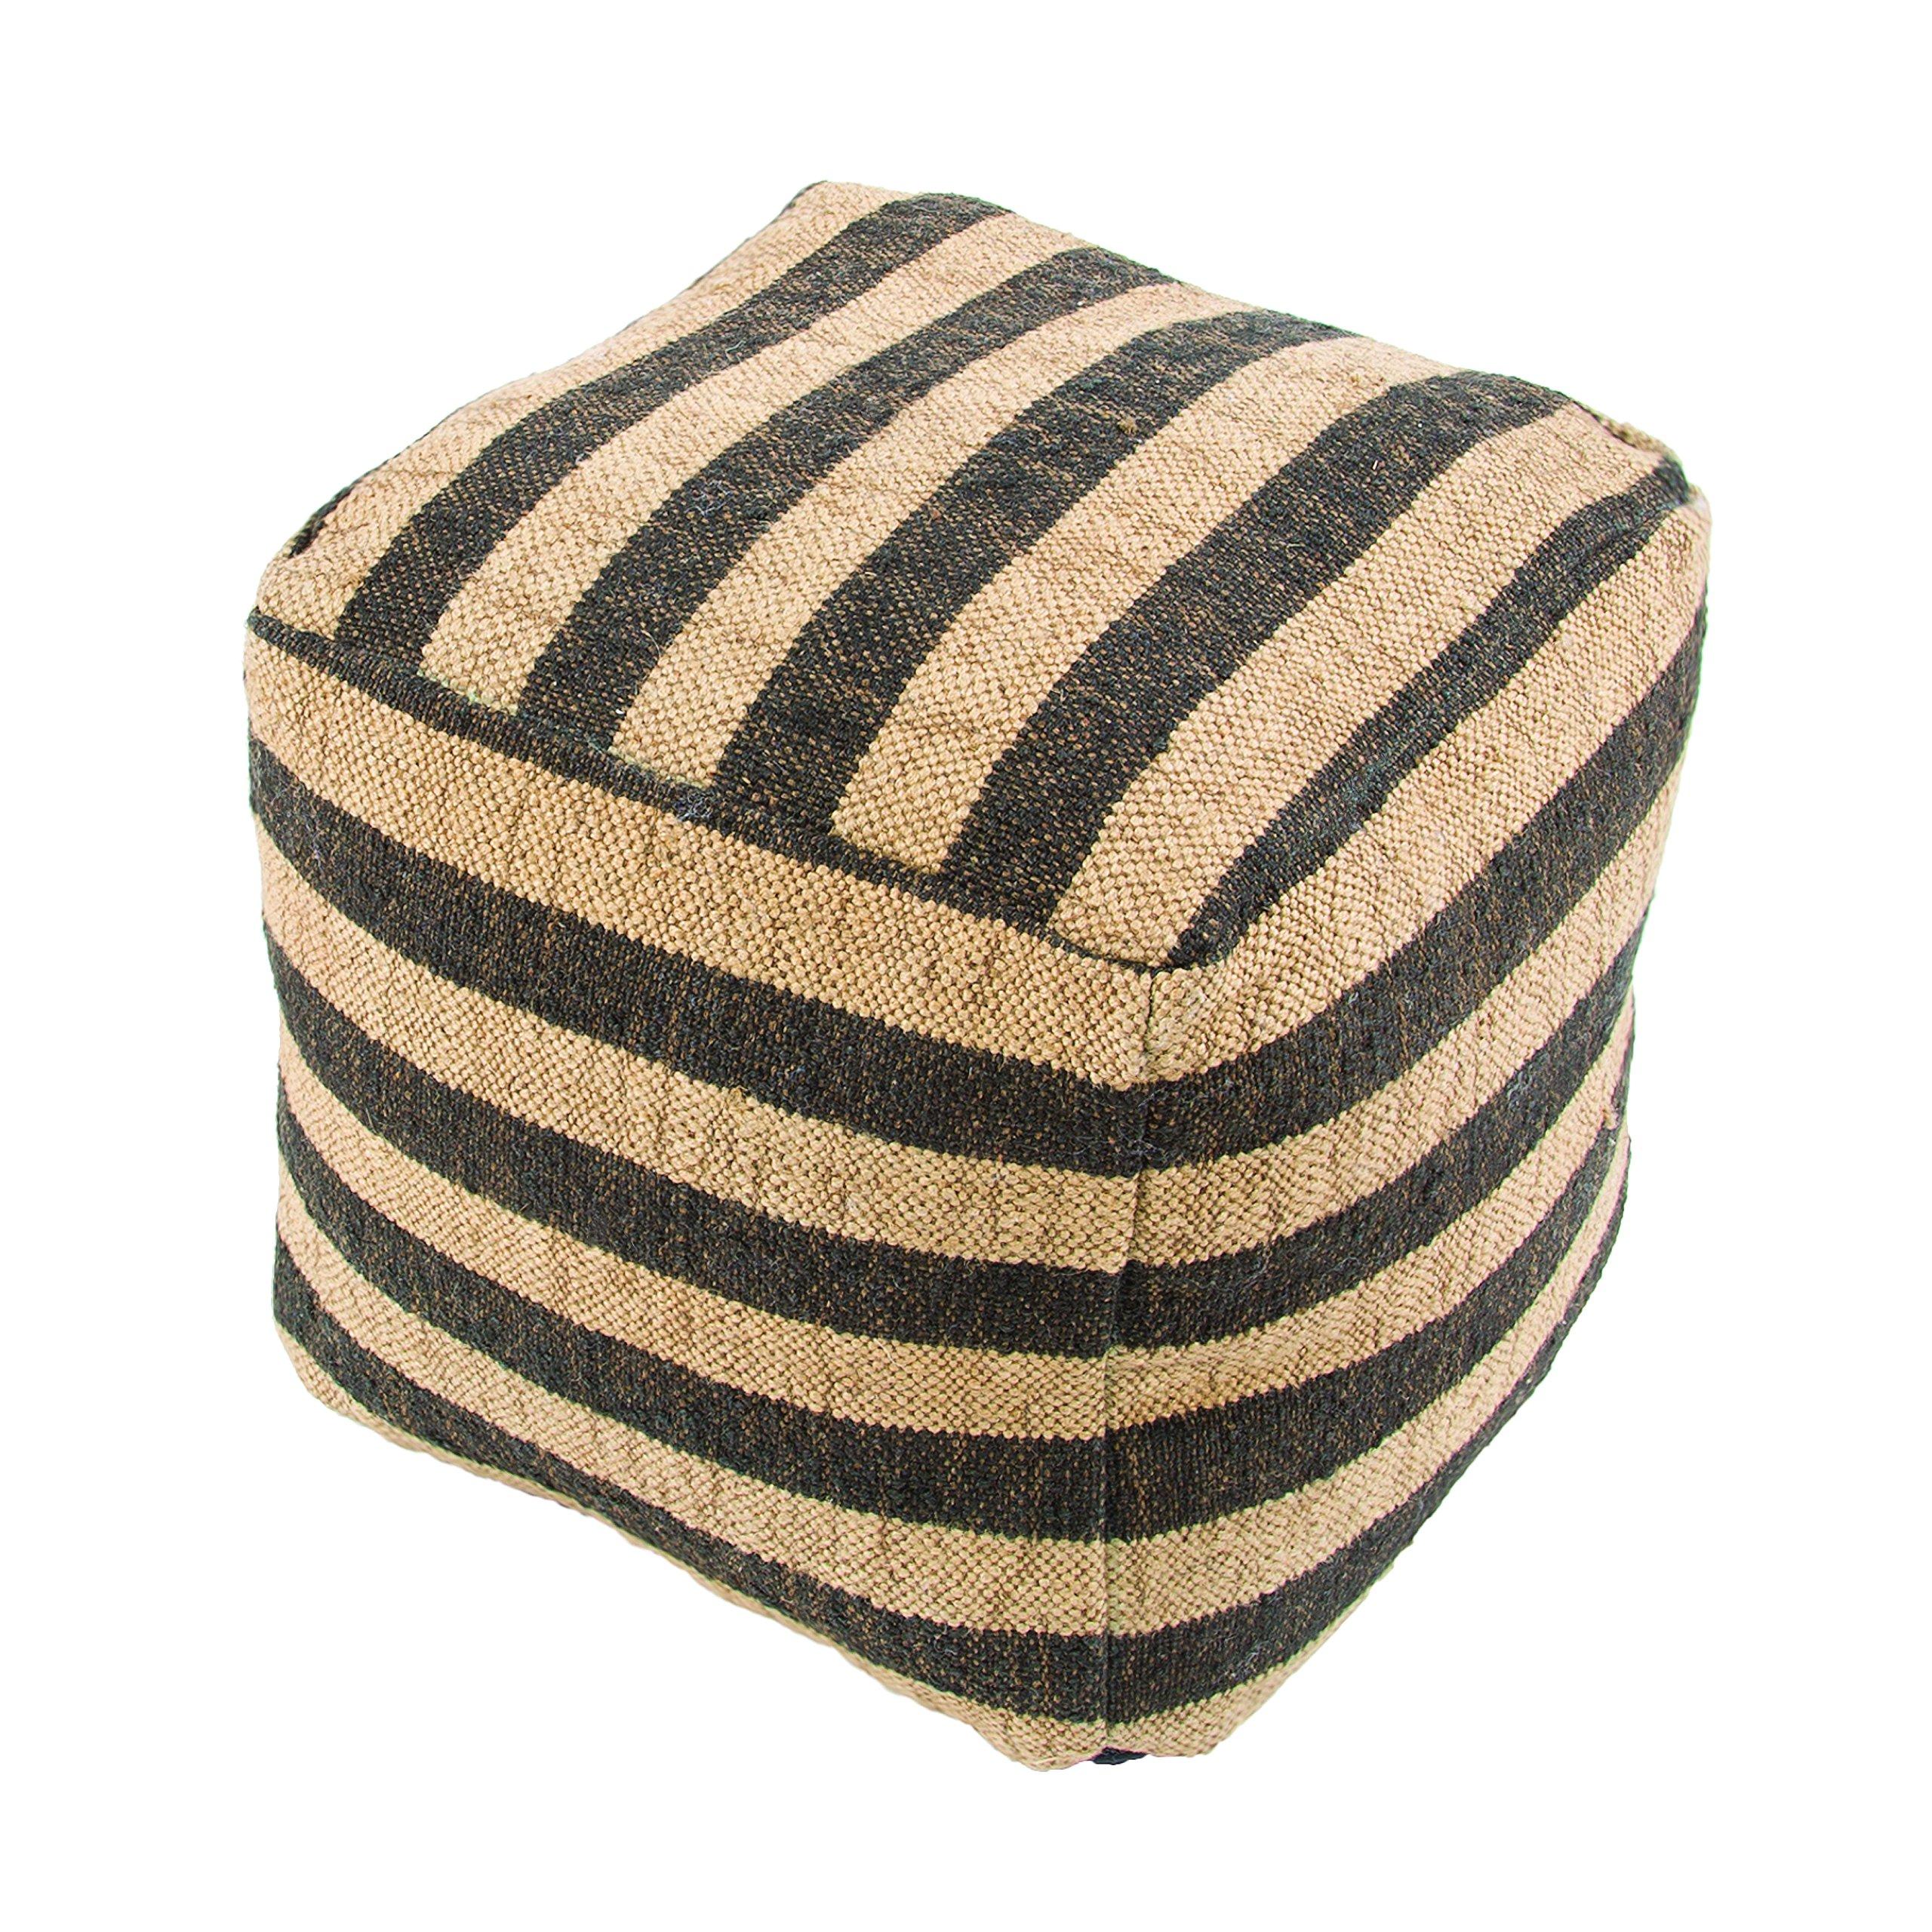 Jaipur Stripe Pattern Ivory/Black Wool Pouf, 16-Inch x 16-Inch x 16-Inch, Phantom Metal